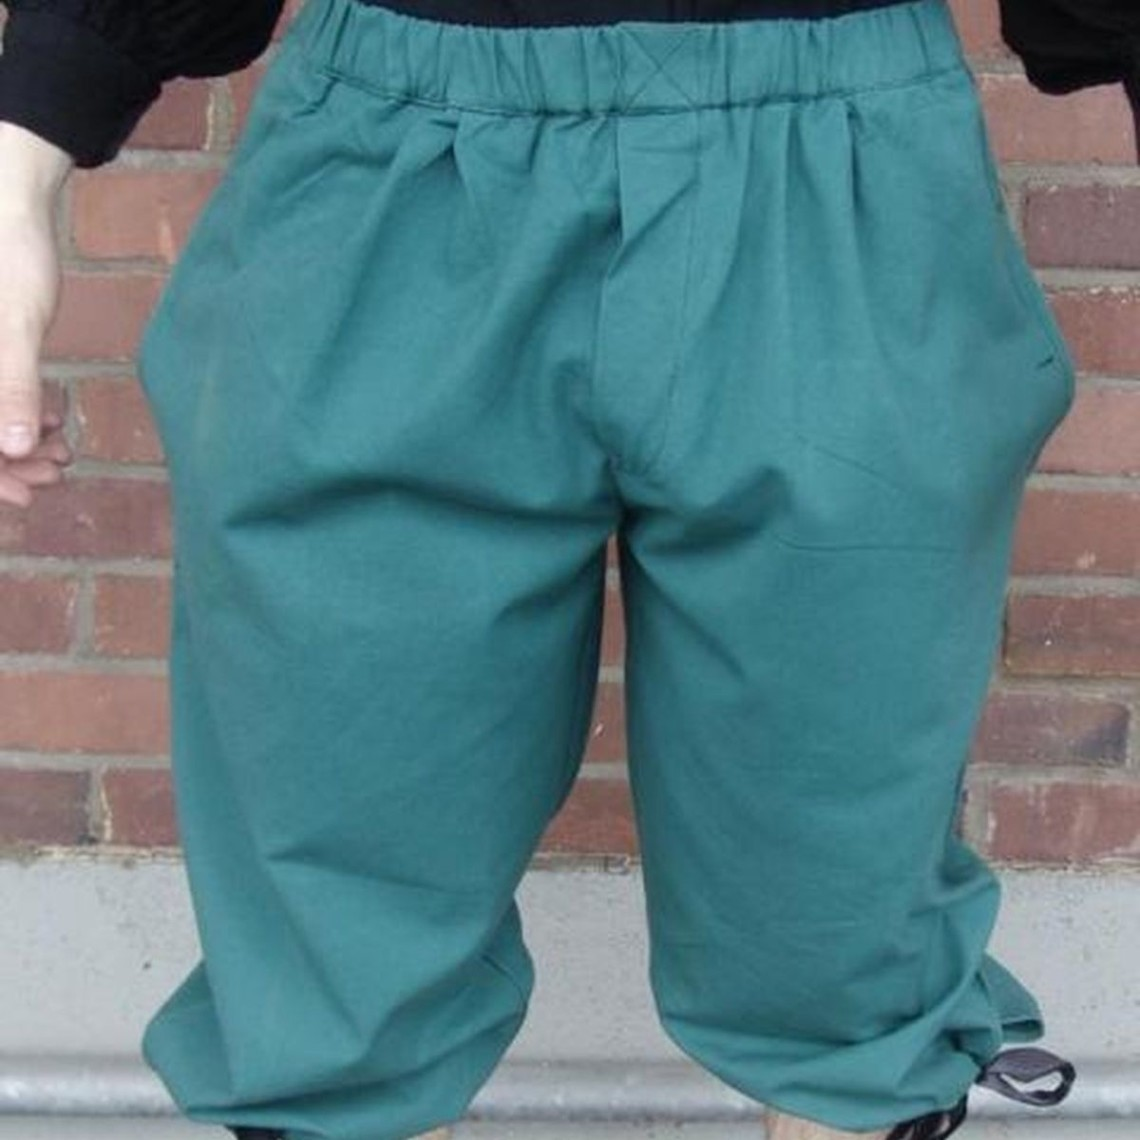 Leonardo Carbone Pantalones tres cuartos, verde